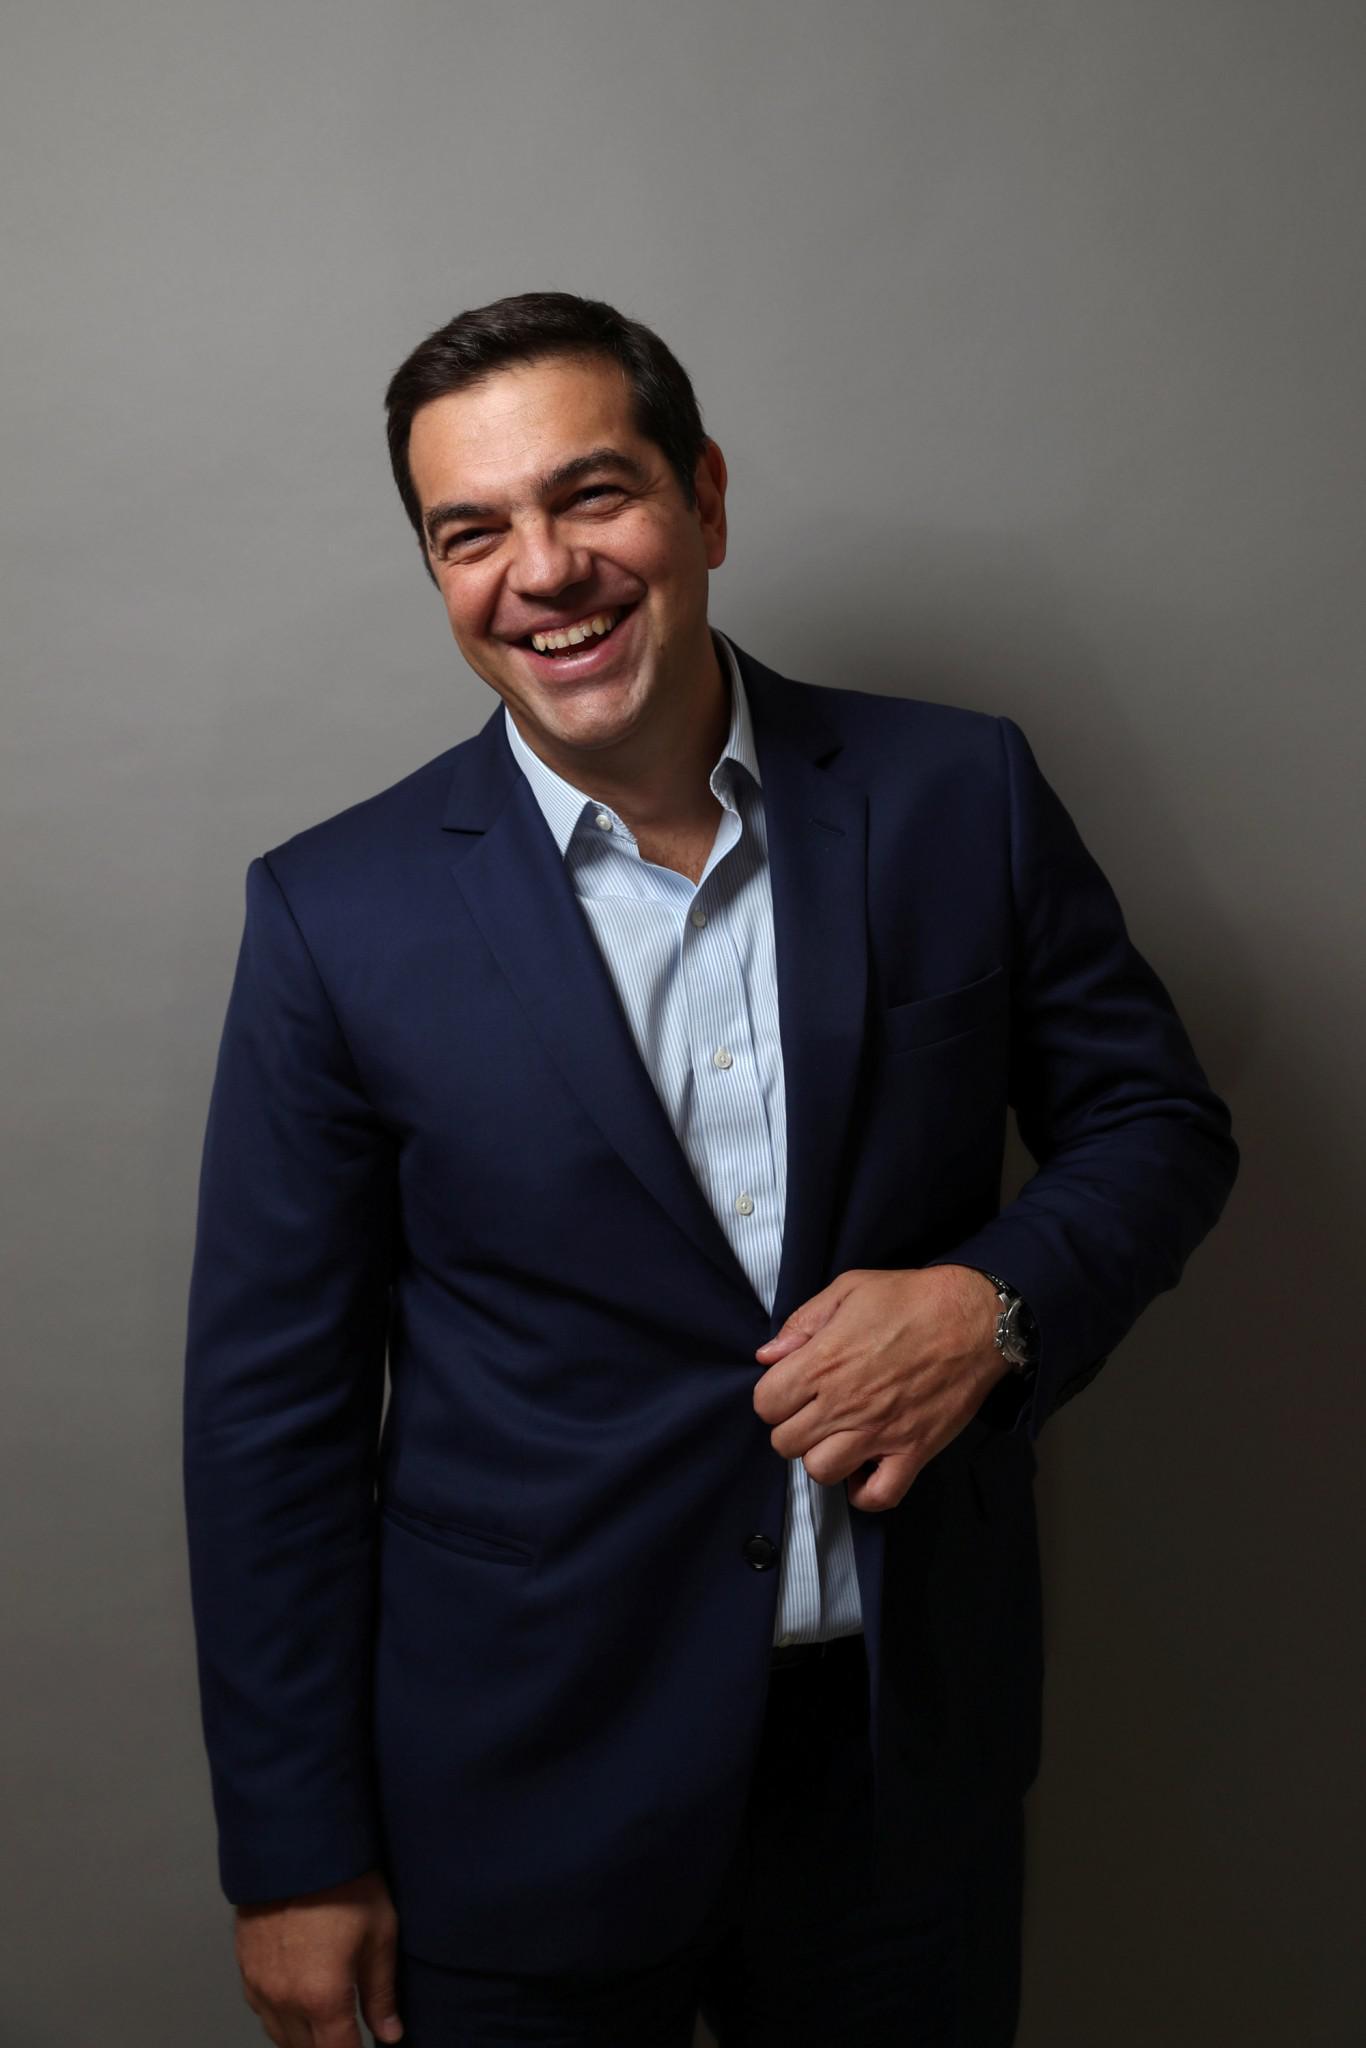 tsipras-reuters8-1300